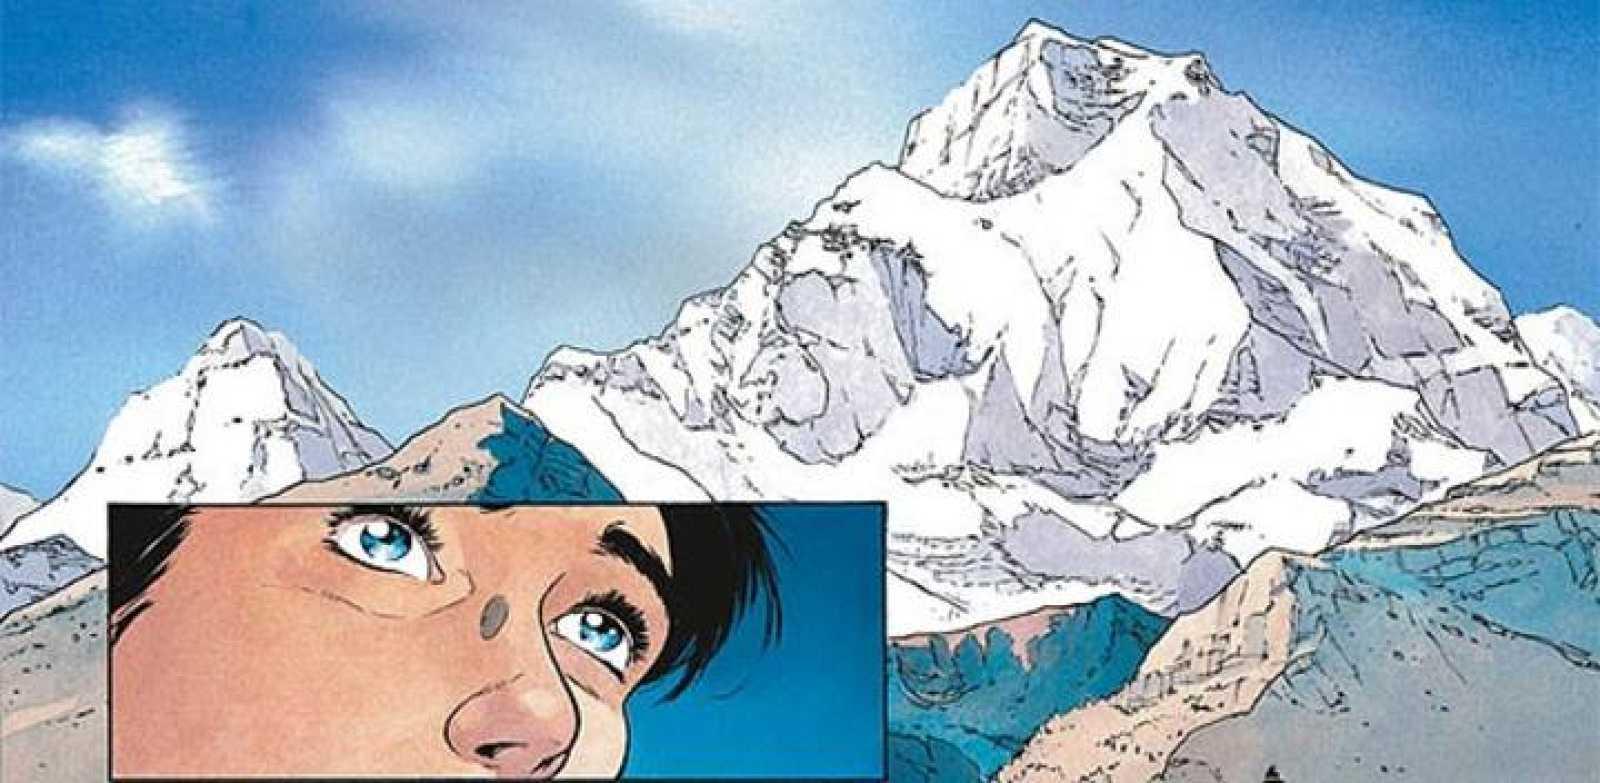 Viñetas de 'Nèvè', de Dieter y Lepage